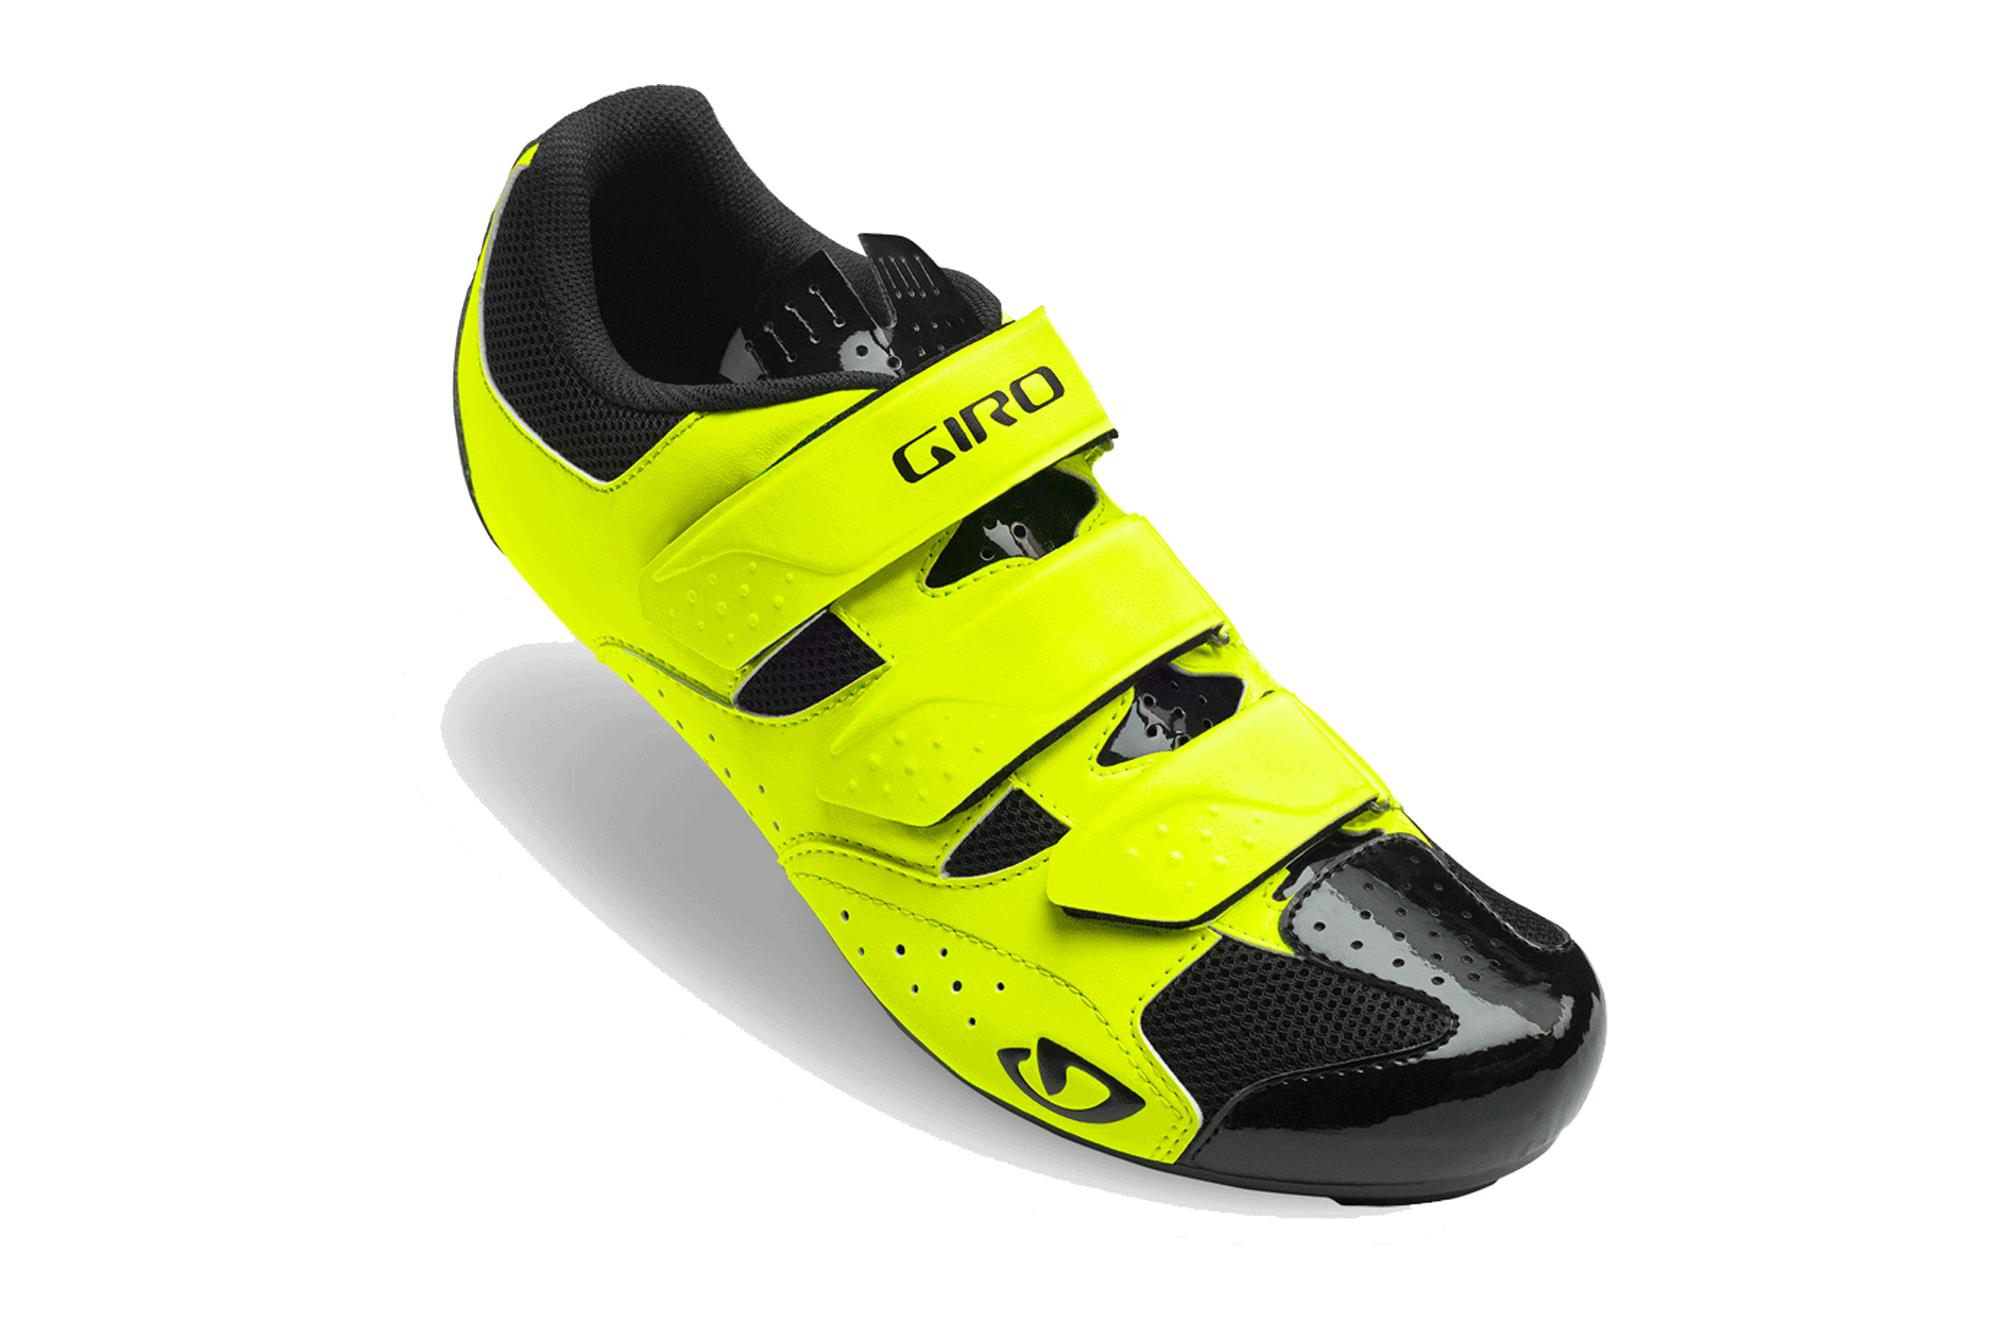 6f22e1df8 Giro Techne cycling shoes review - Cycling Weekly